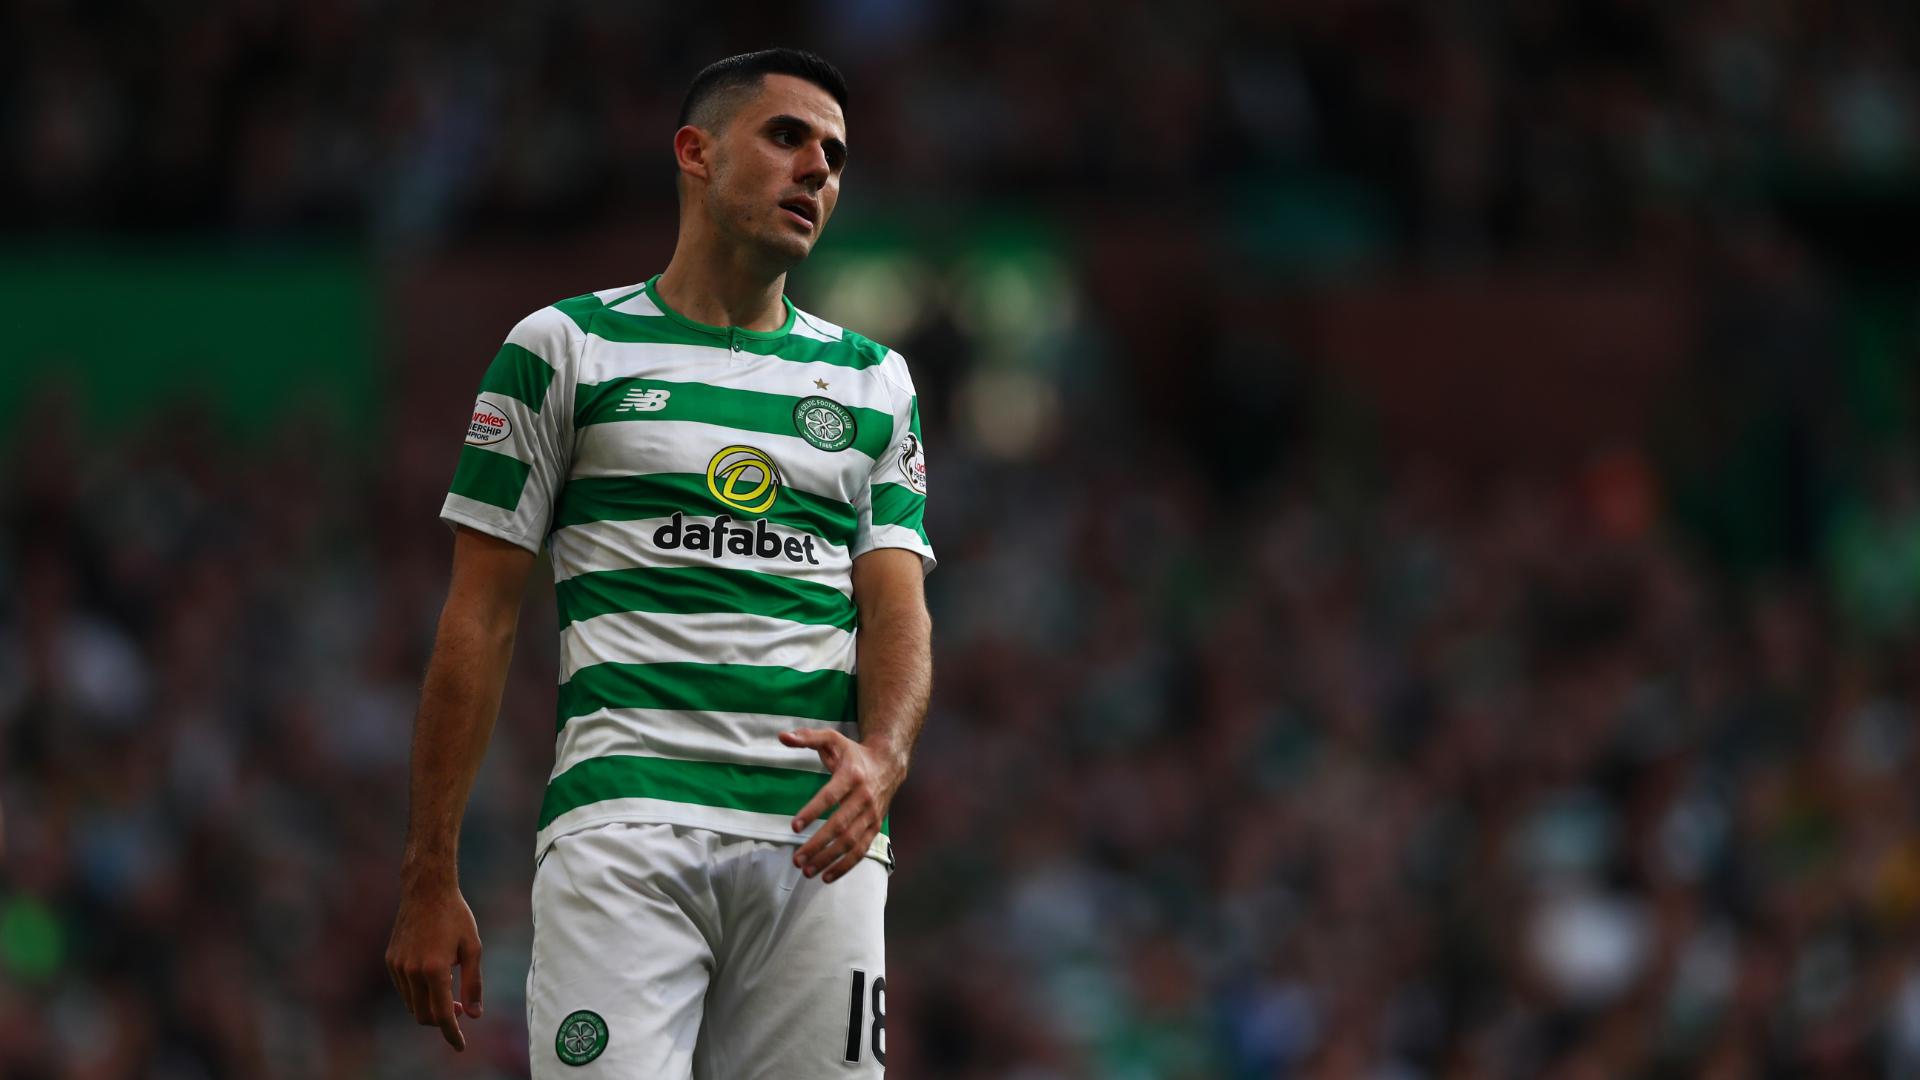 'Rogic has Premier League quality so Qatar is a shock' – Celtic star's transfer call surprises Australia coach Meulensteen